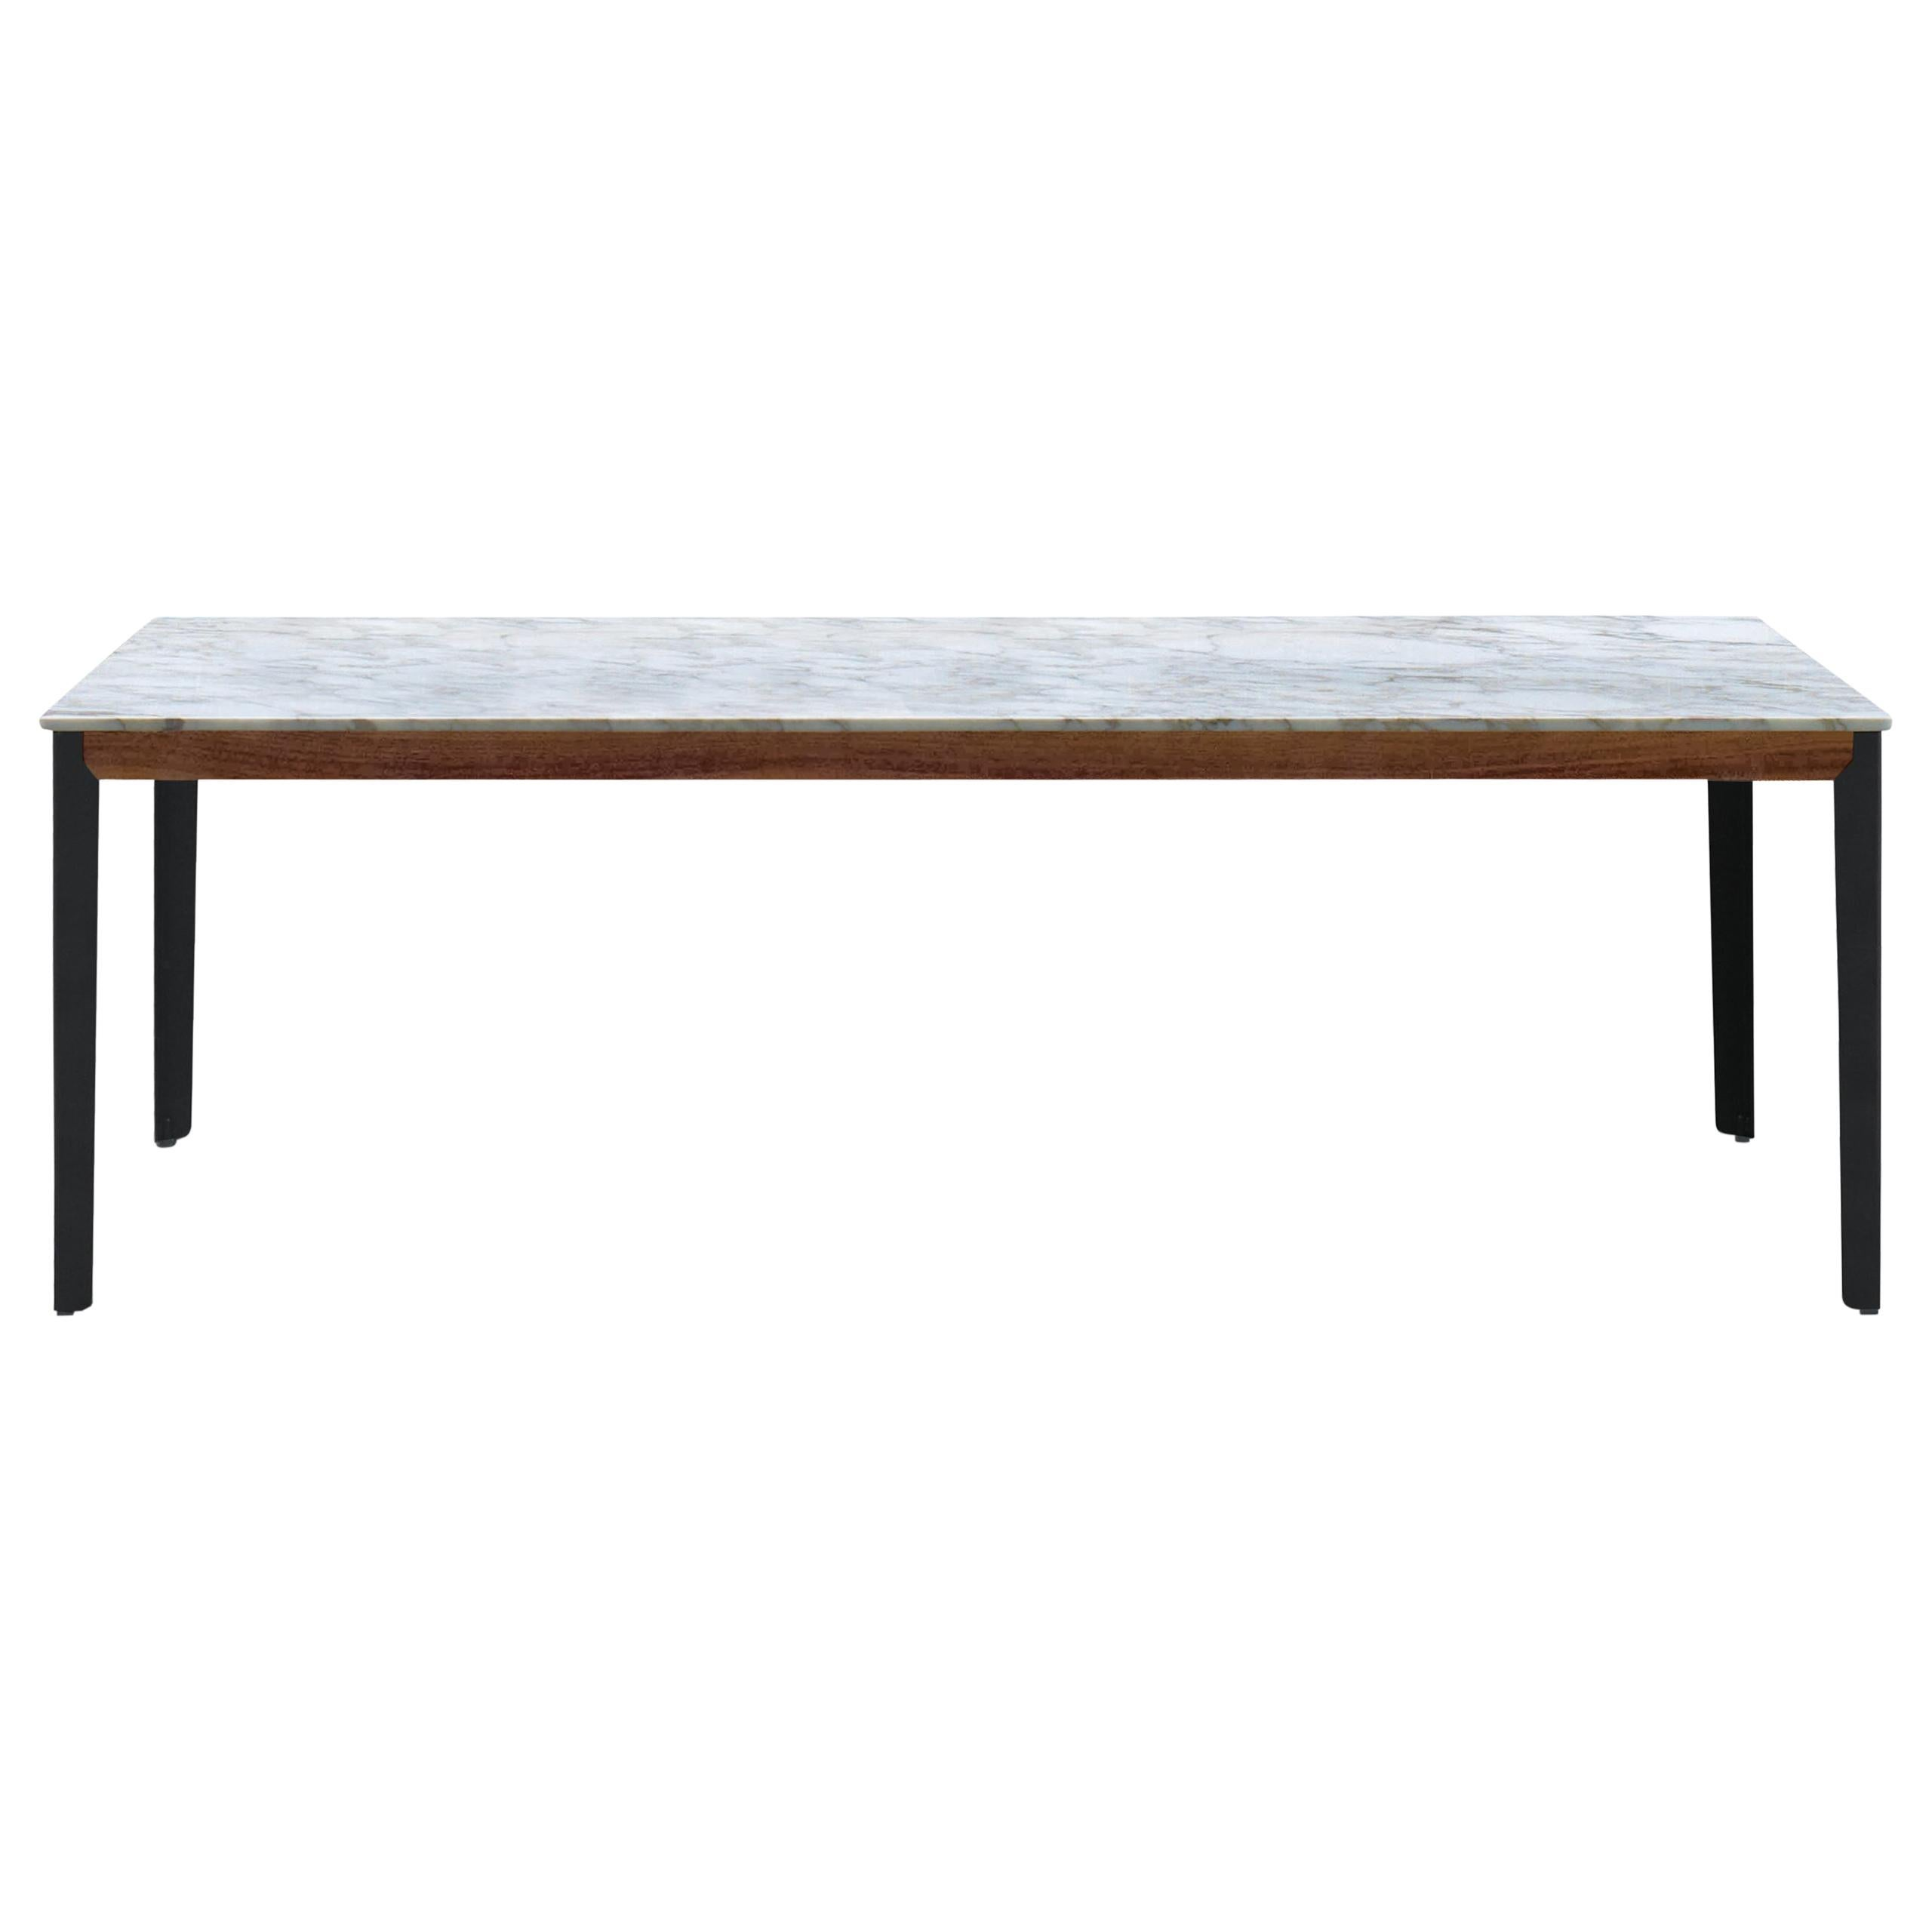 Arflex Hug Table in Carrara Marble Top with Metal Base by Claesson Koivisto Rune